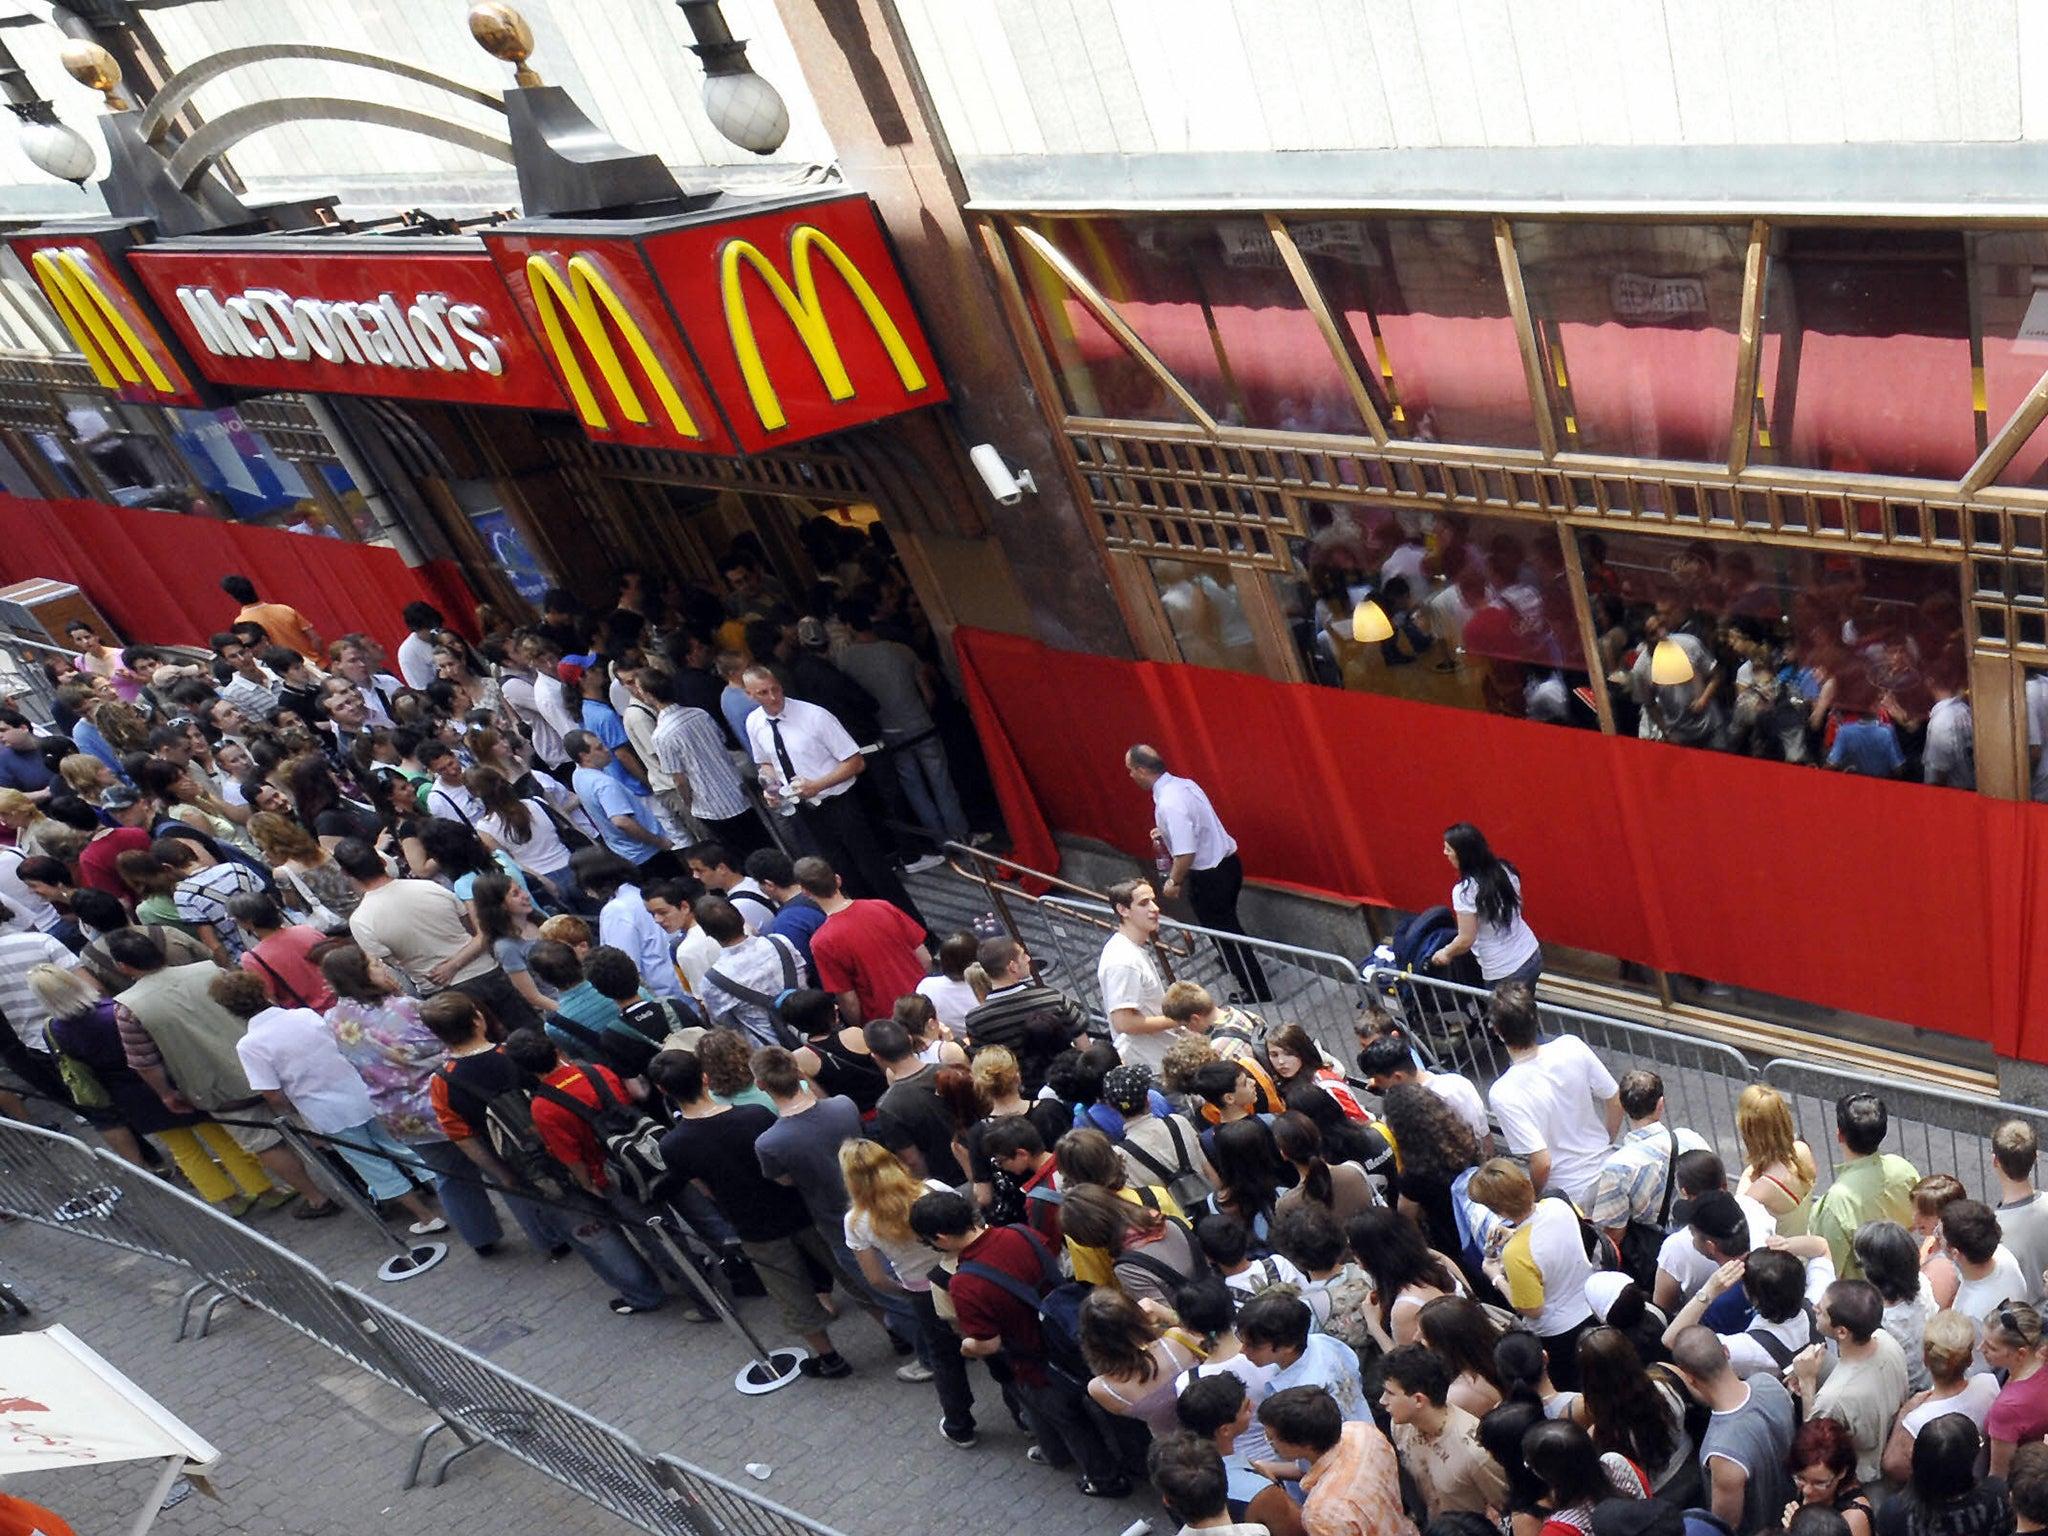 McDonald's kick out homeless man after customer buys him food | The